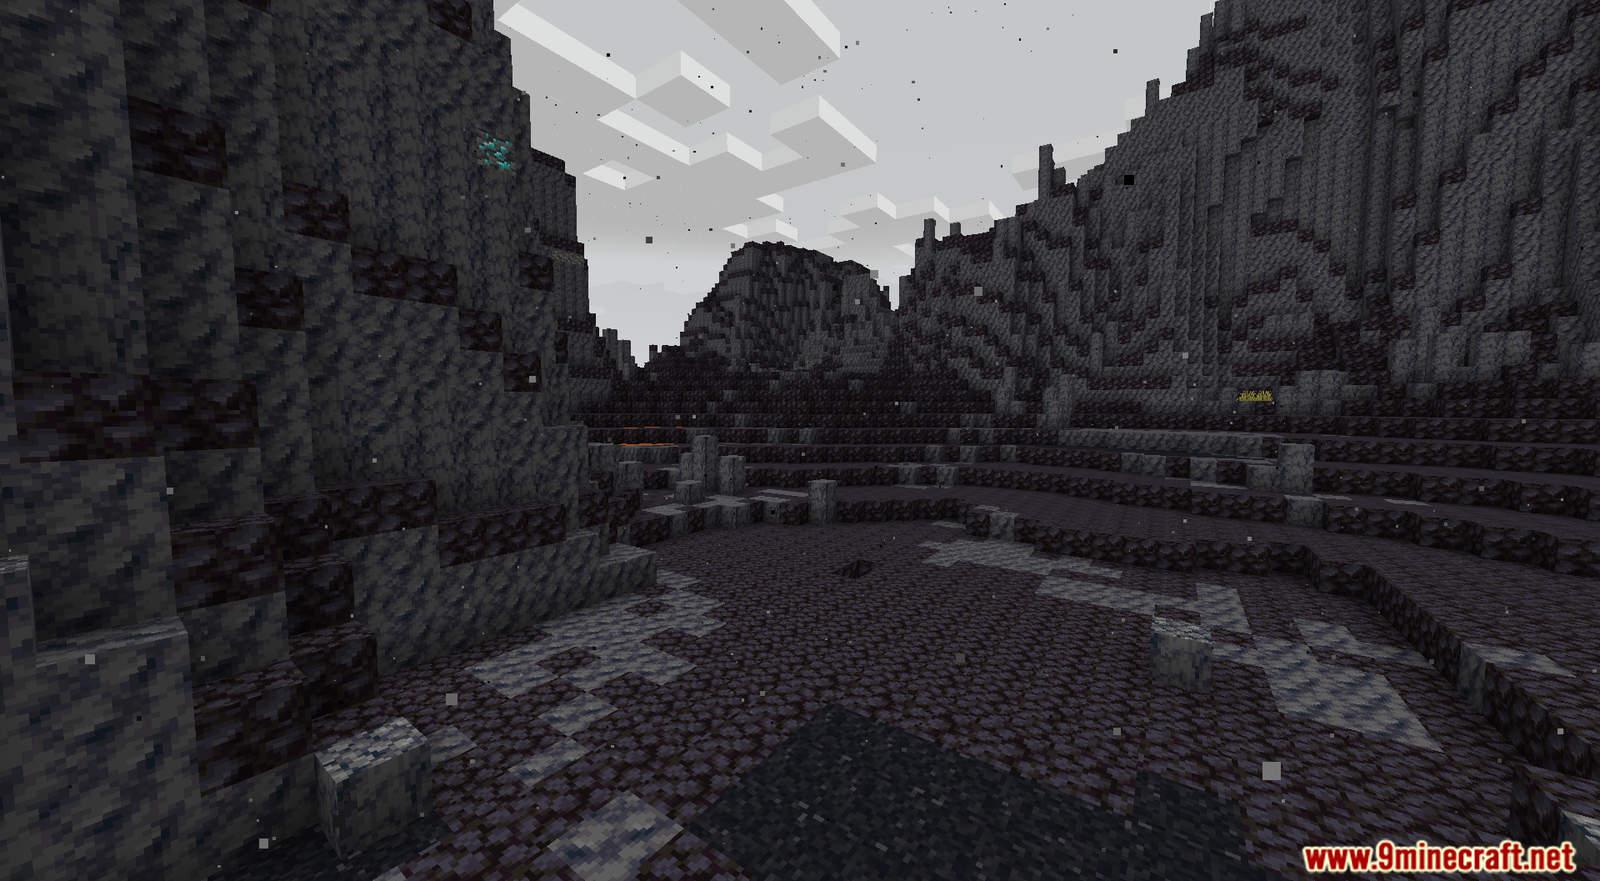 William Wythers' Overhauled Overworld Mod for Minecraft (21)